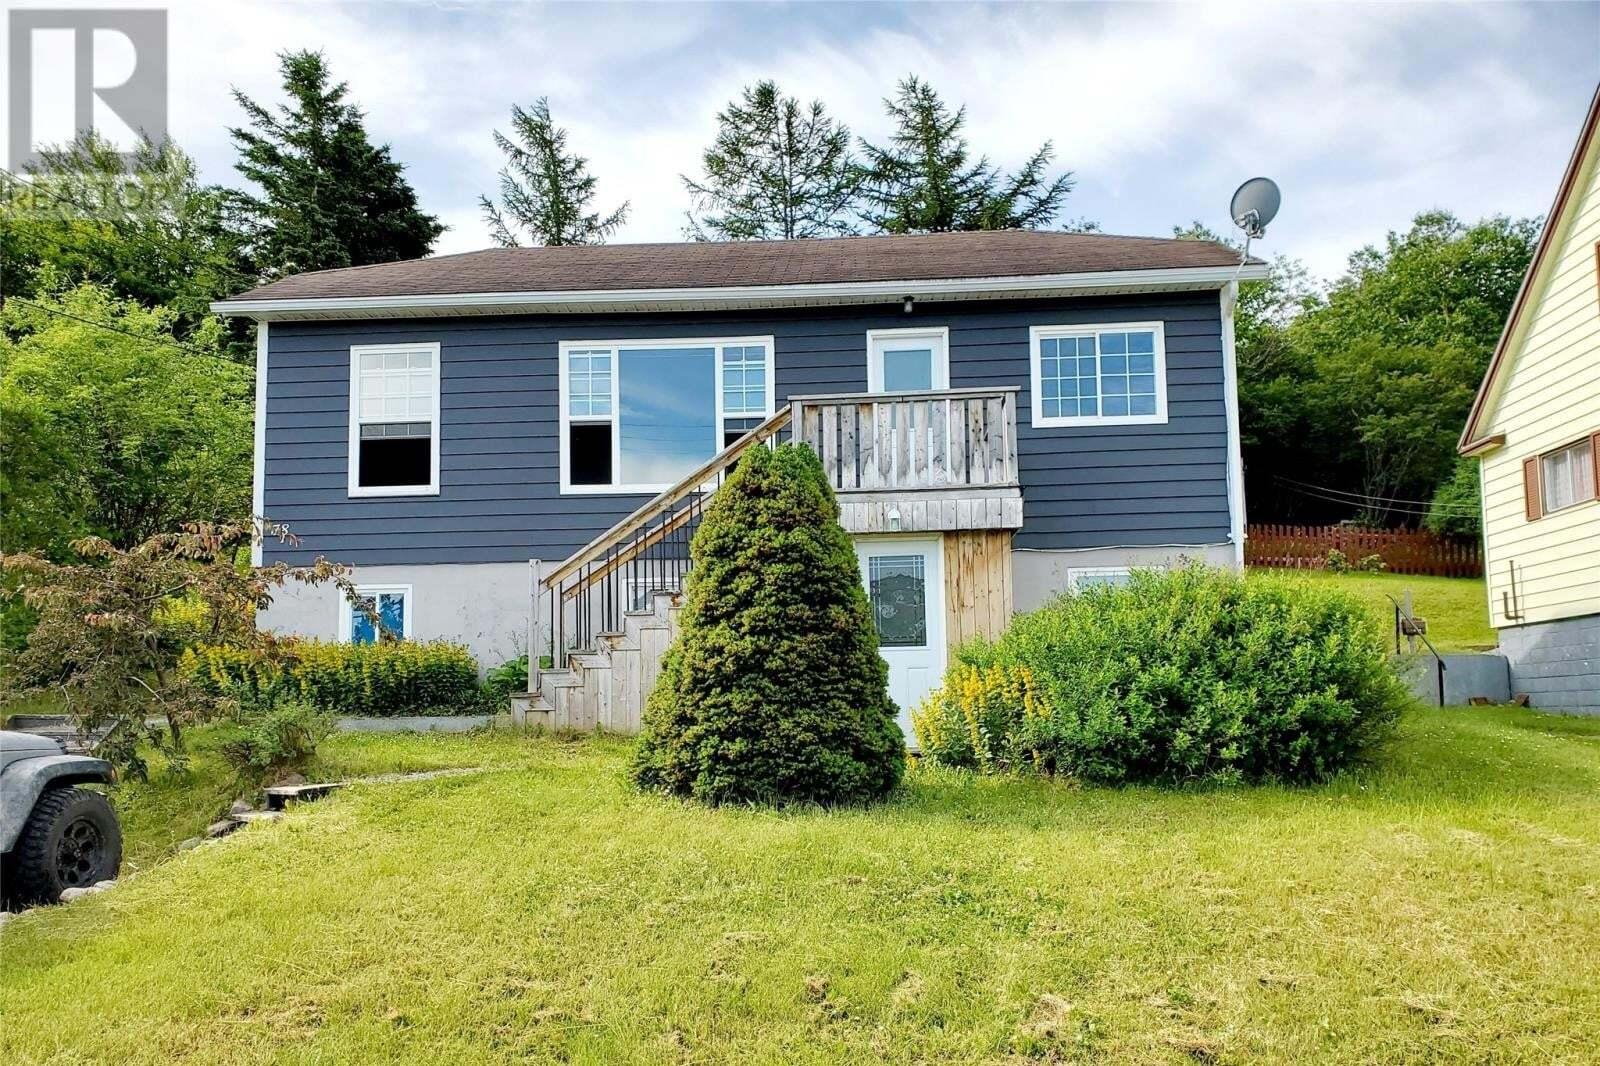 House for sale at 78 Clarence St Corner Brook Newfoundland - MLS: 1217838